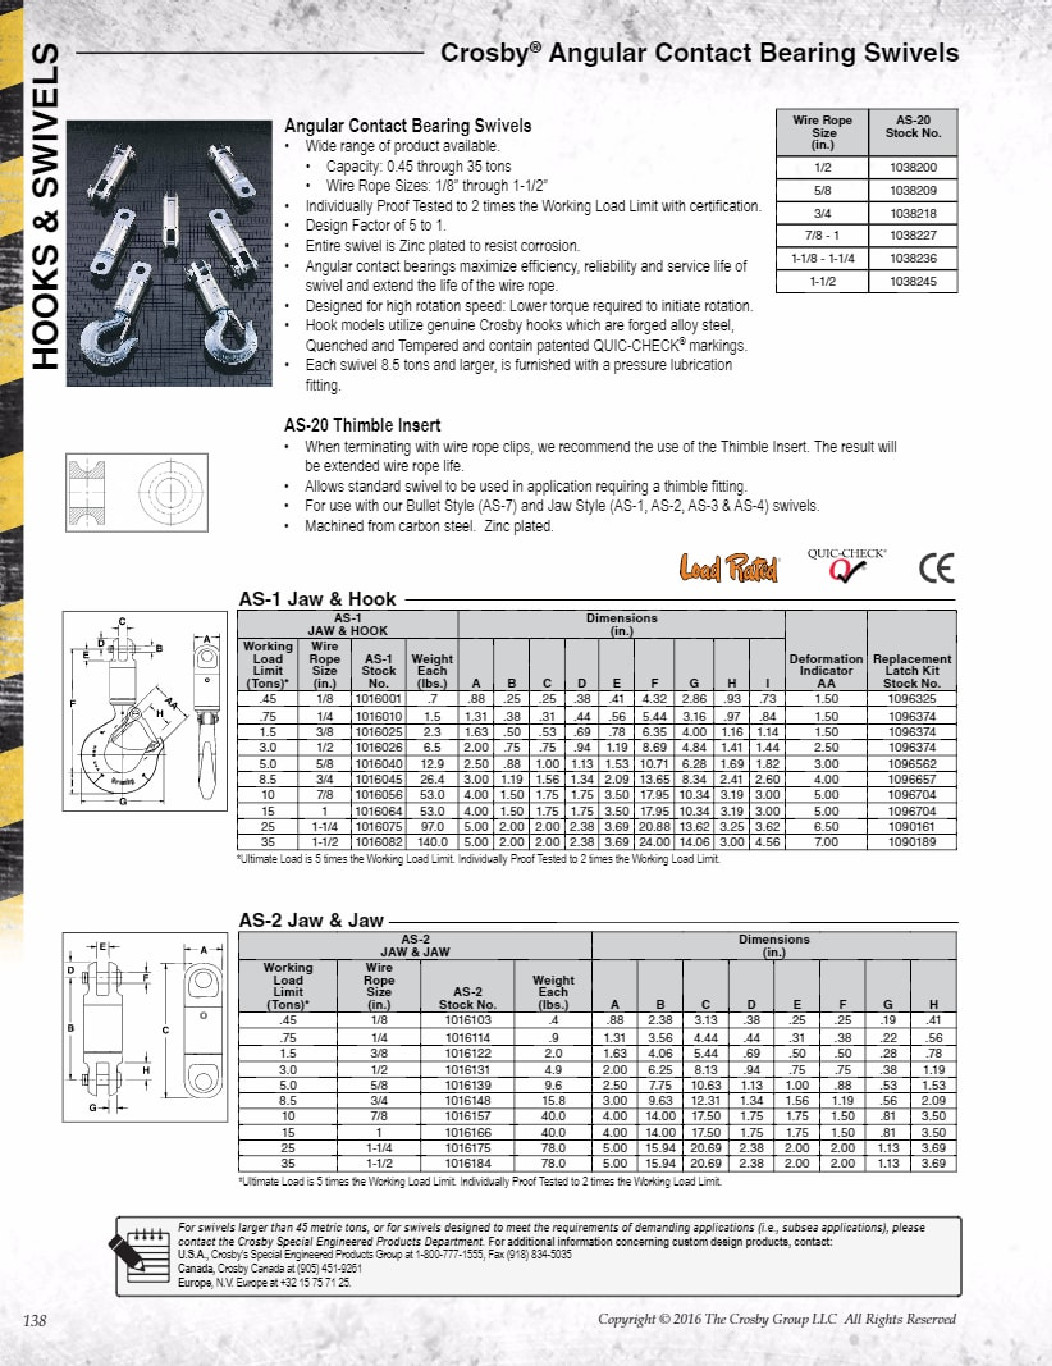 Luxury Metric Wire Rope Capacity Ideas - Wiring Diagram Ideas ...